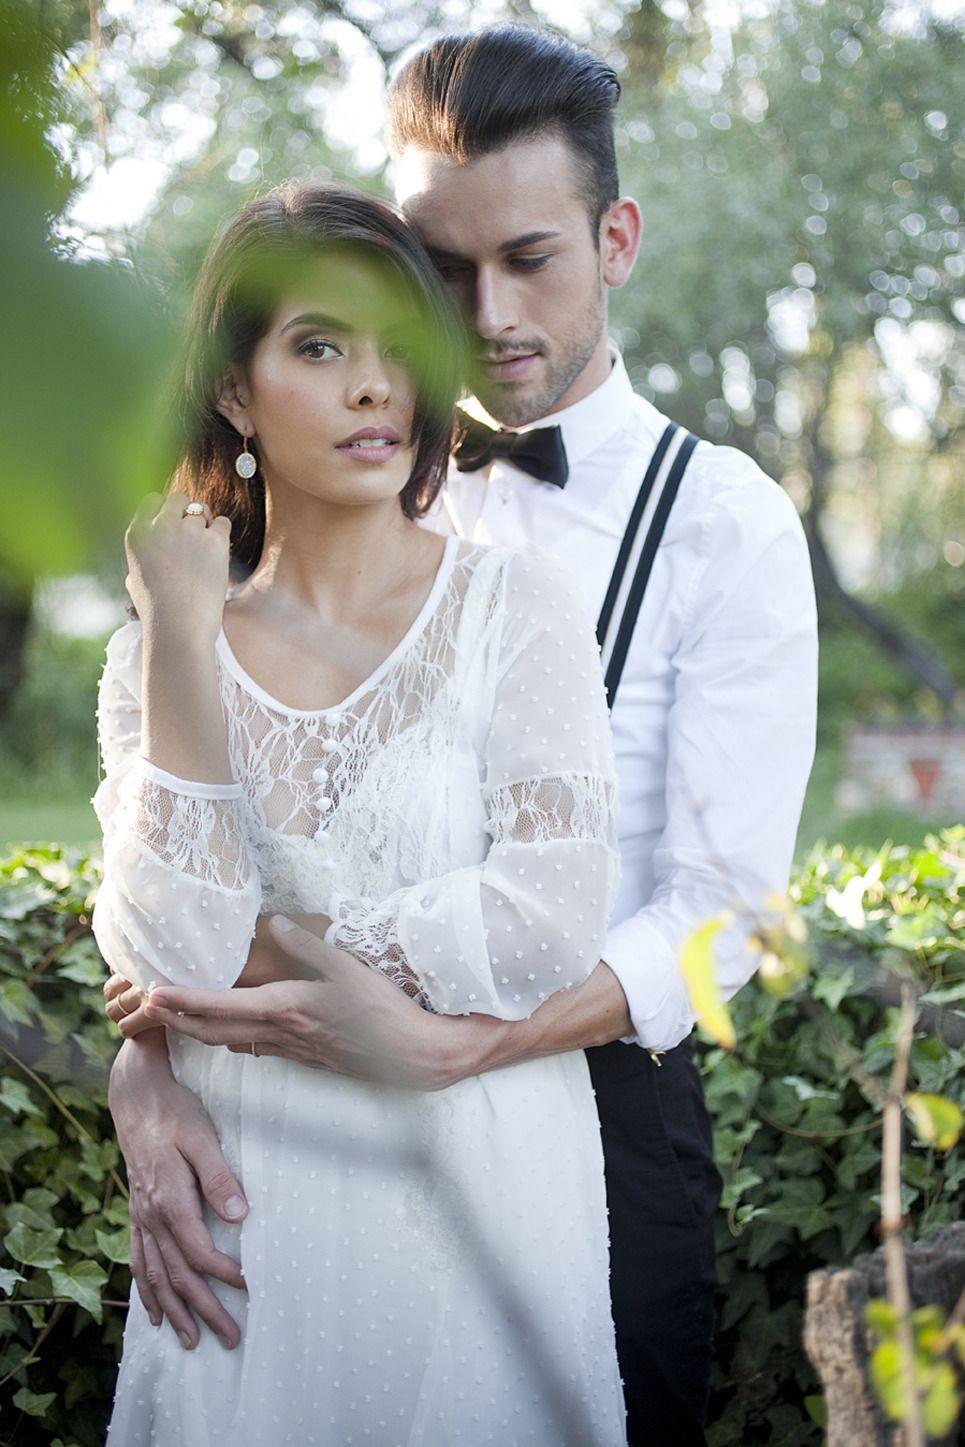 Wedding dresses downtown la  Grass Valley Wedding Inspiration from Jylls Photography  KiraKira